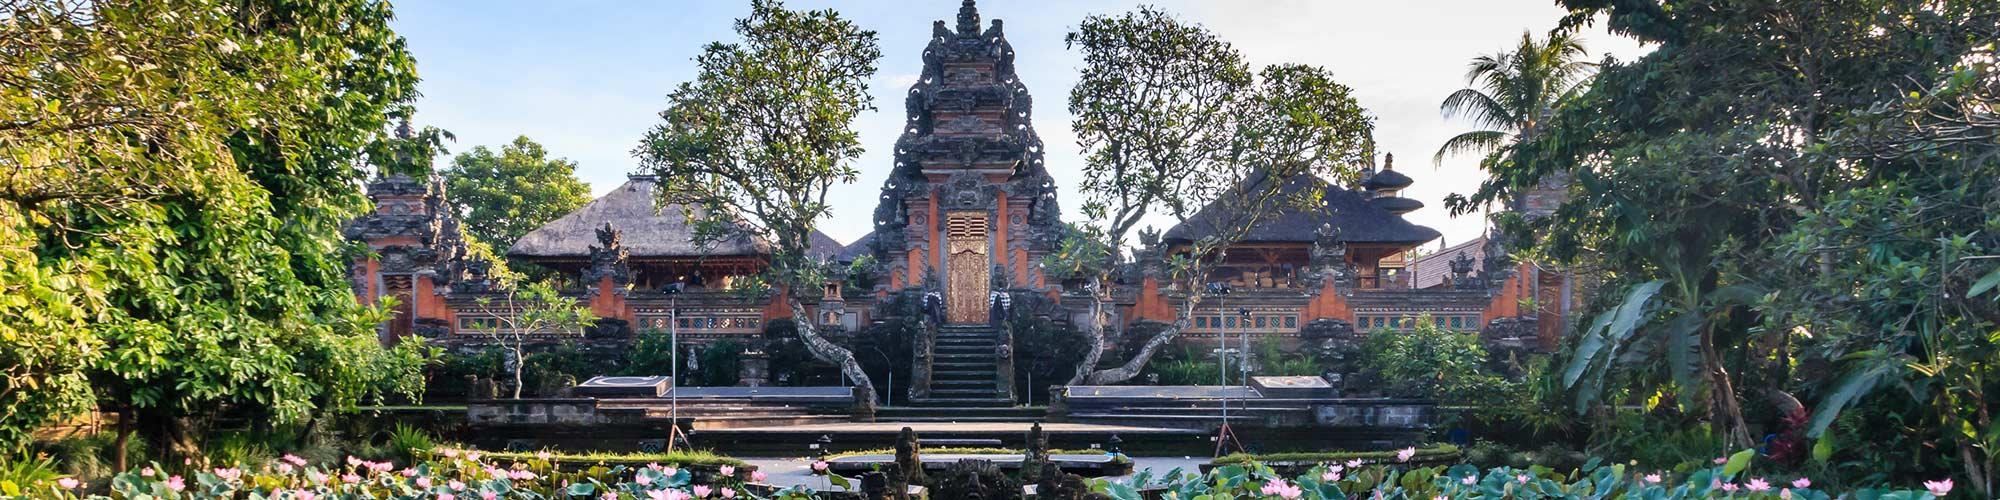 Templo flor de loto, Bali, Indonesia - El Pais Viajes